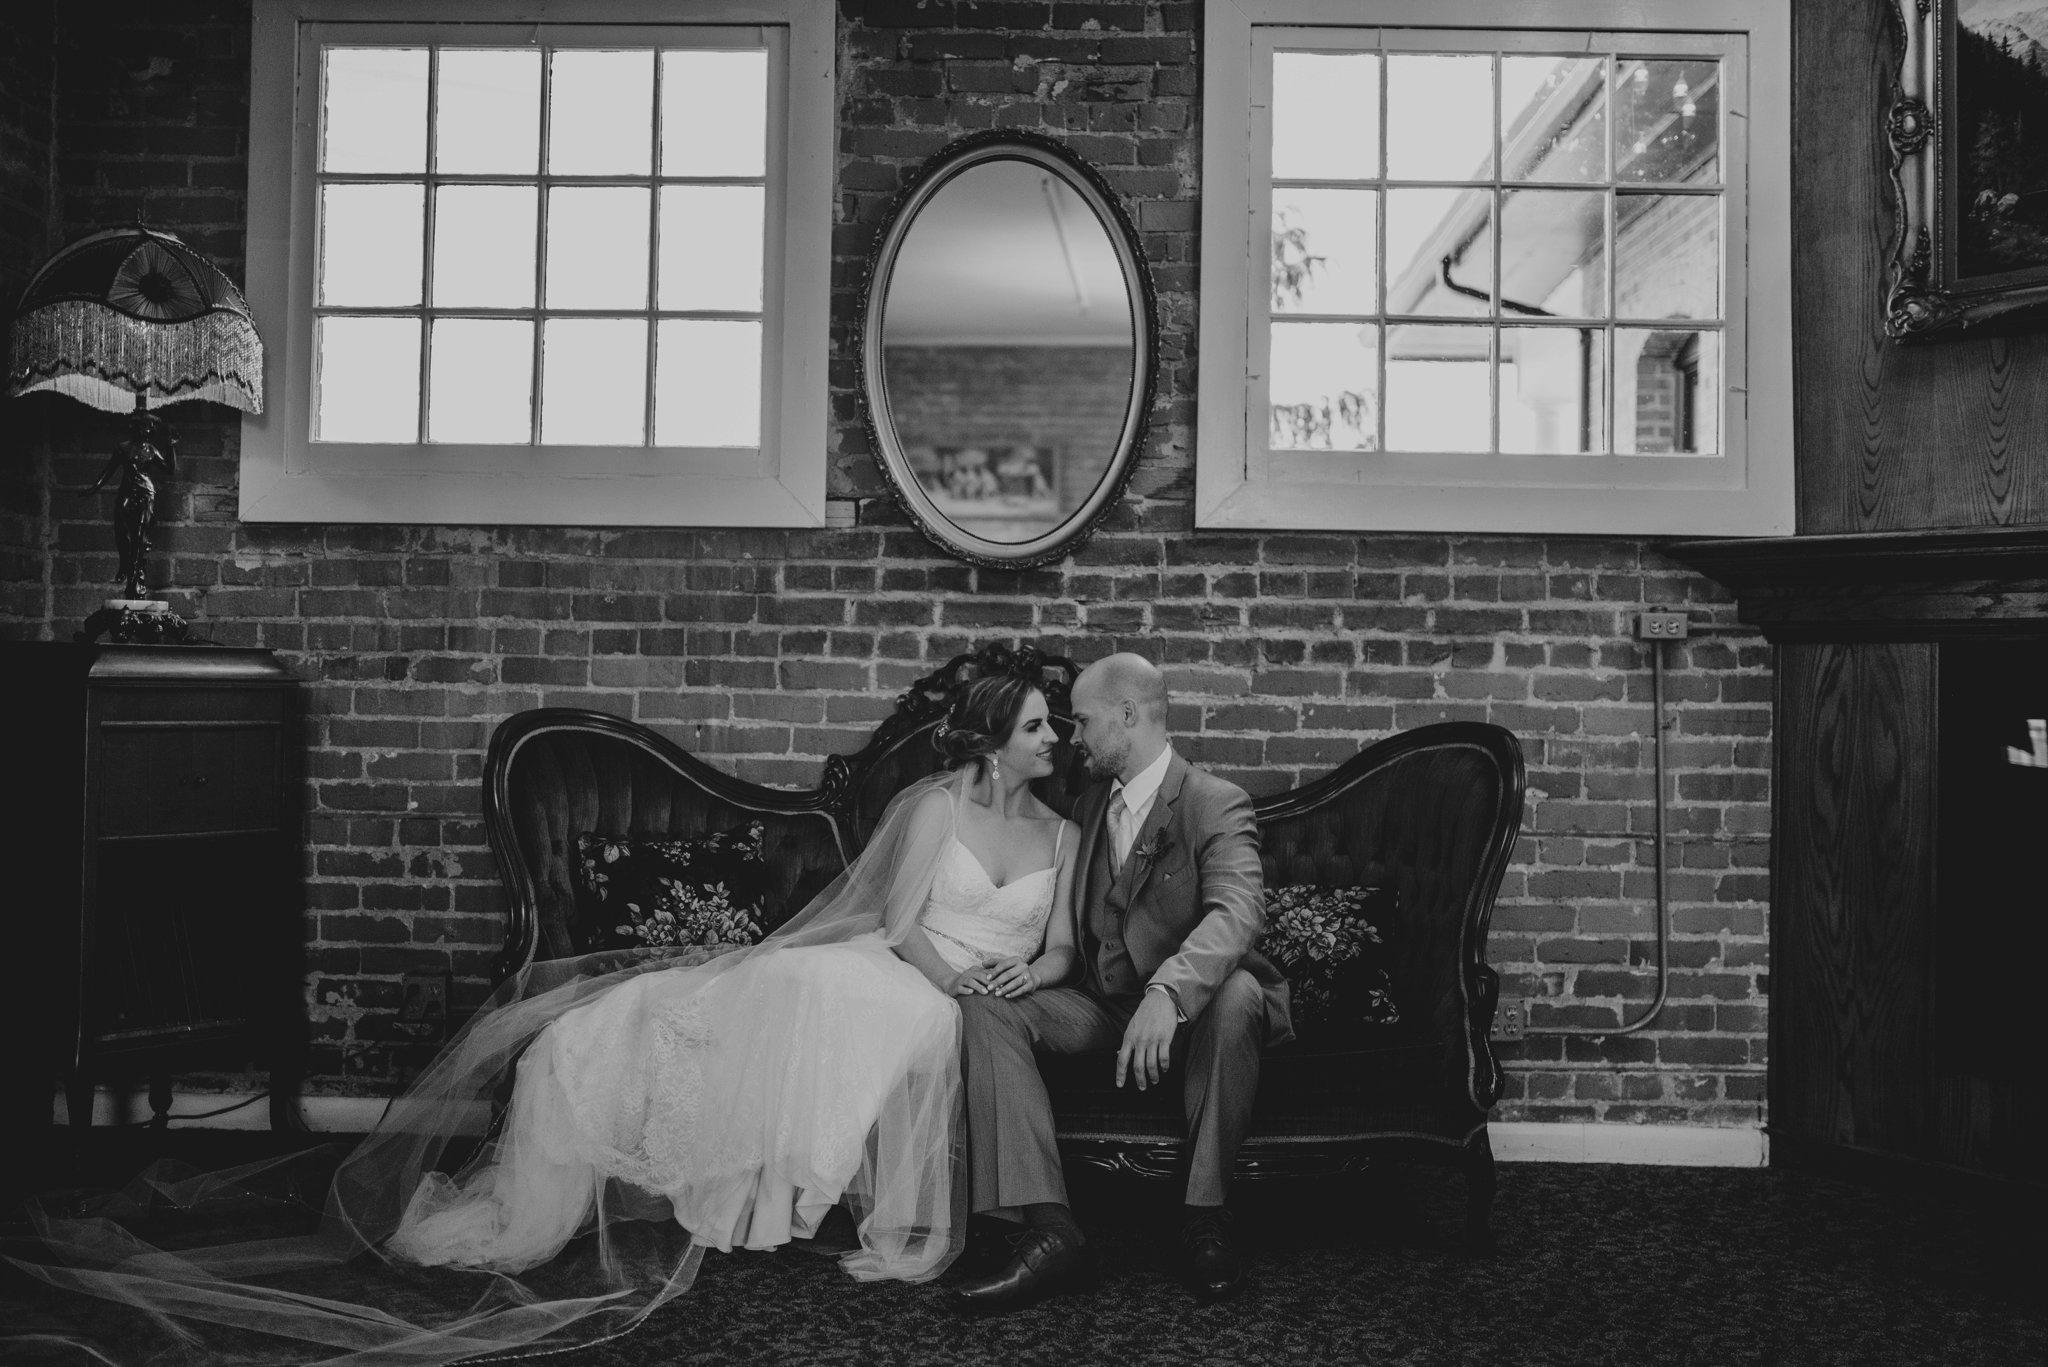 hollywood-school-house-wedding-seattle-photographer-caitlyn-nikula-65.jpg